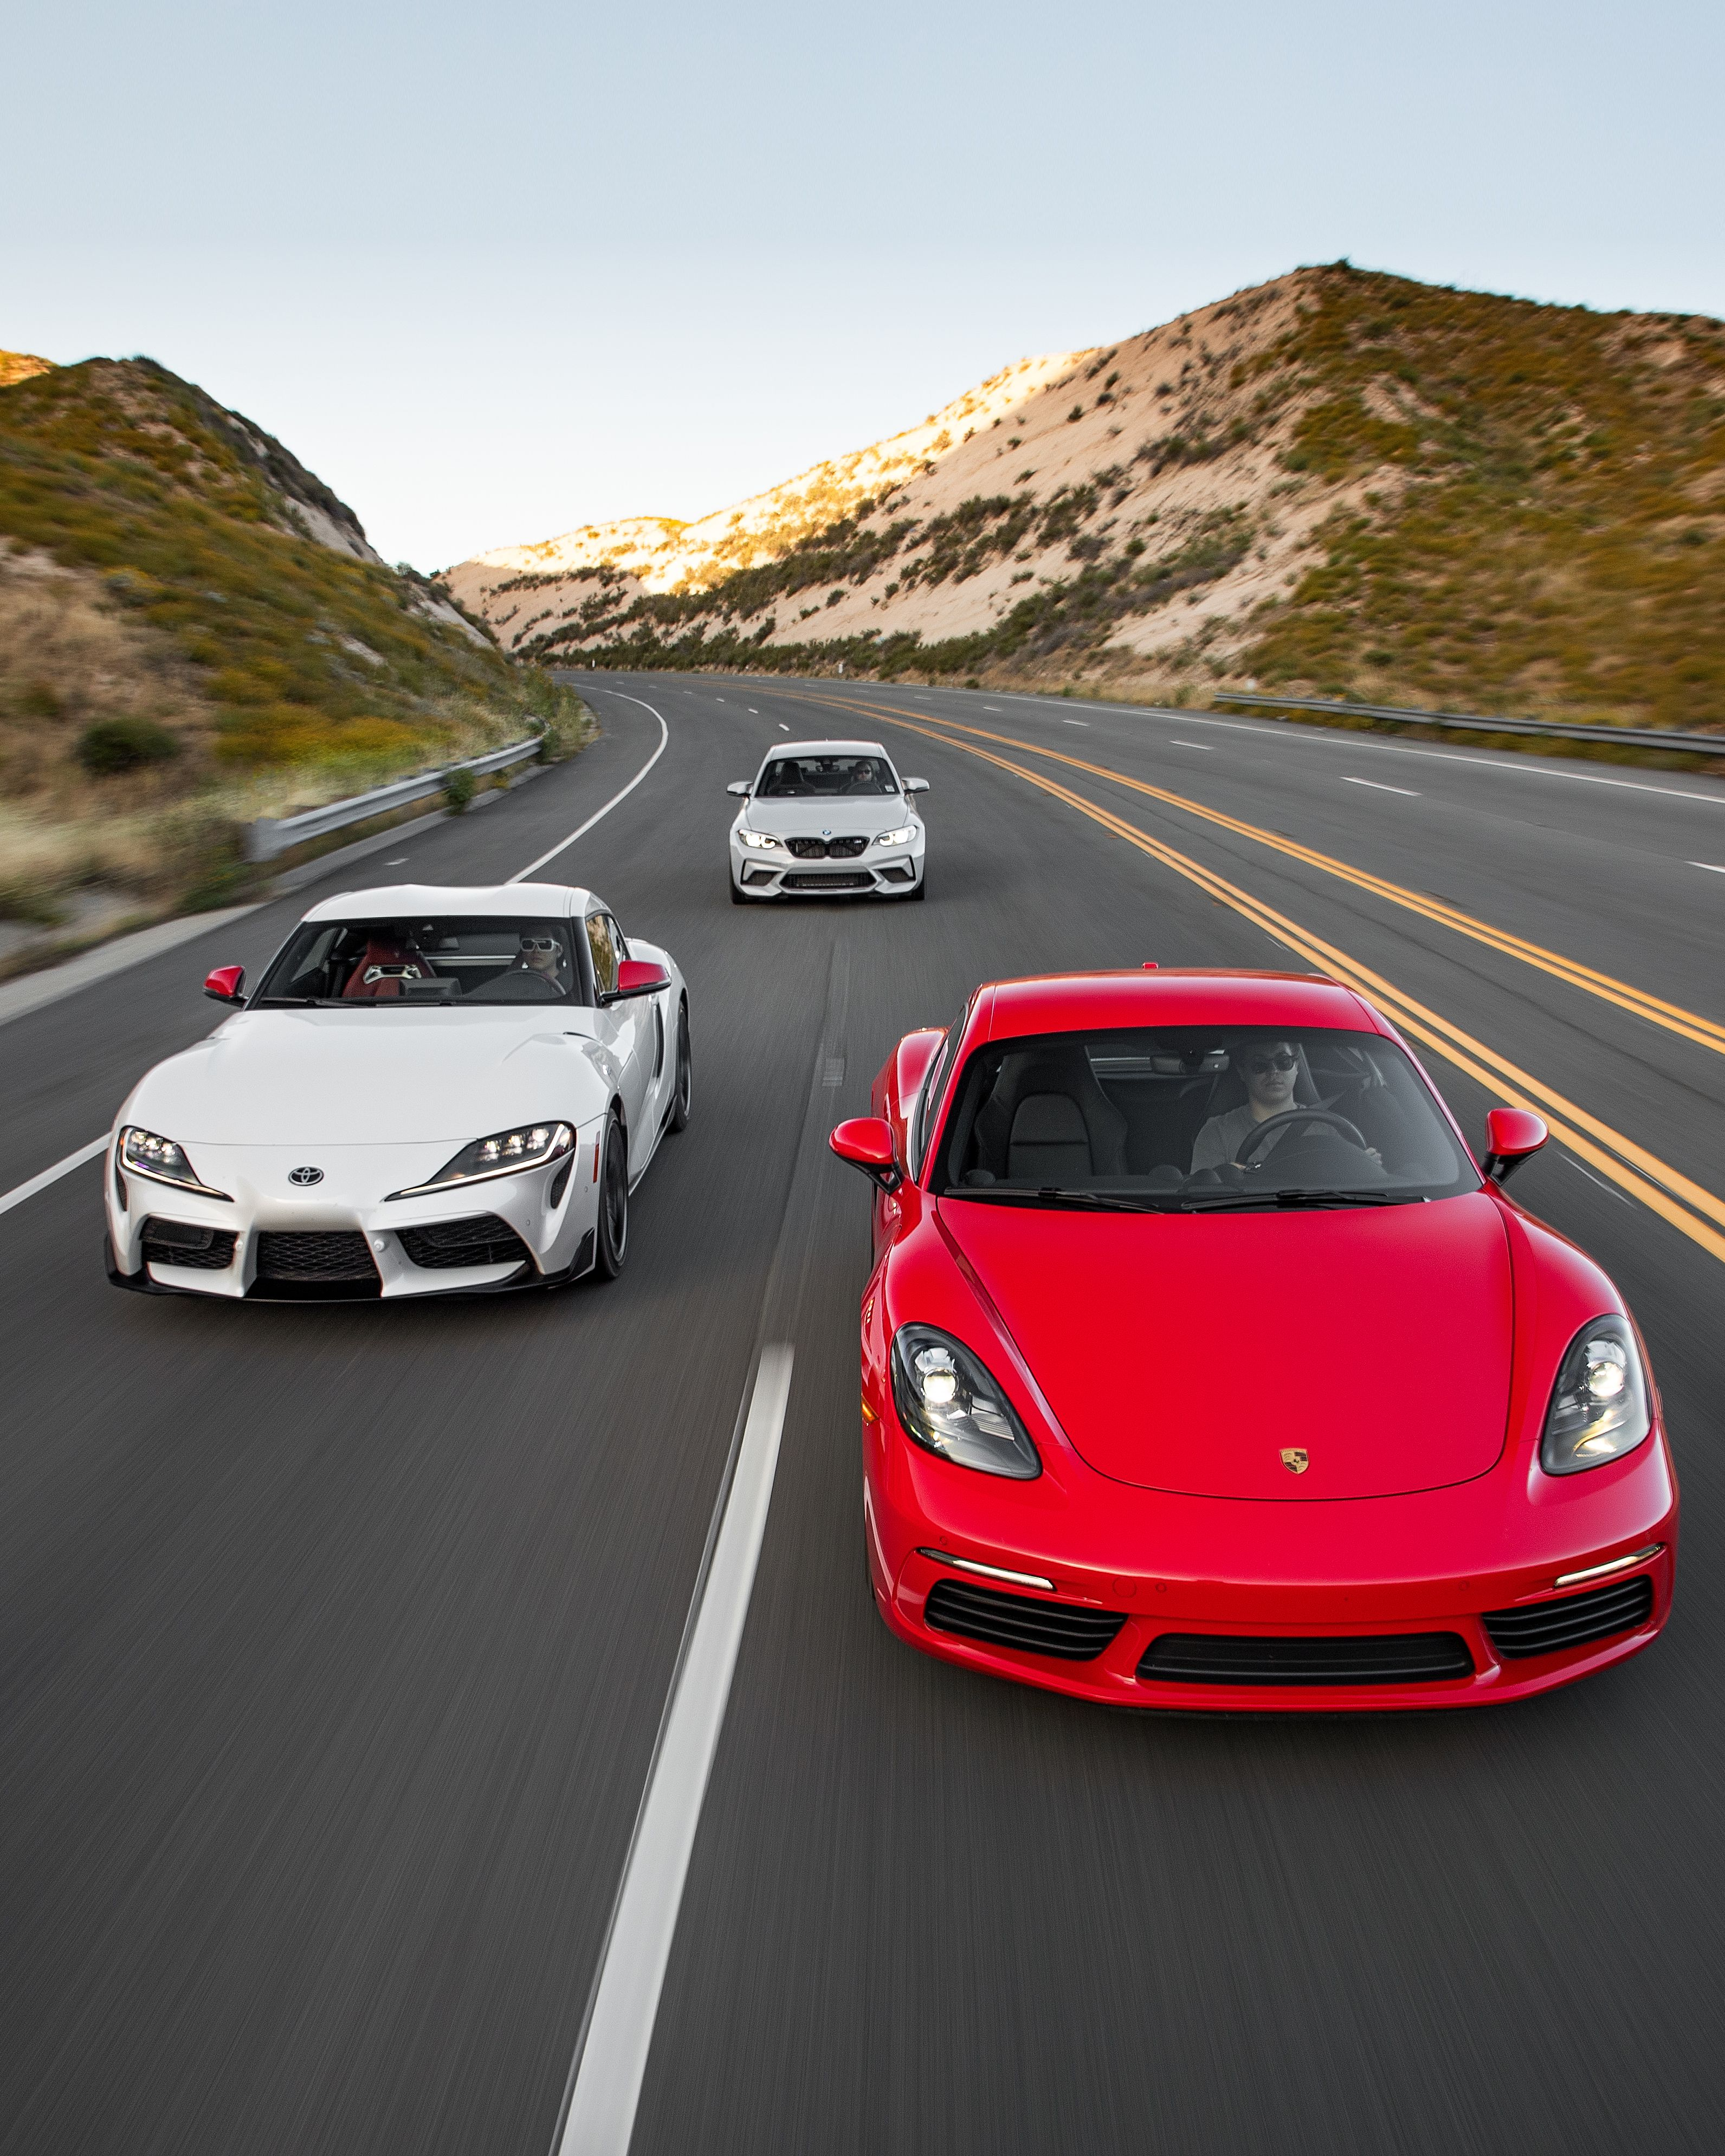 2020 Toyota Supra Vs Porsche 718 Cayman Vs Bmw M2 Competition Sports Car Comparison Toyota Supra Bmw M2 Bmw